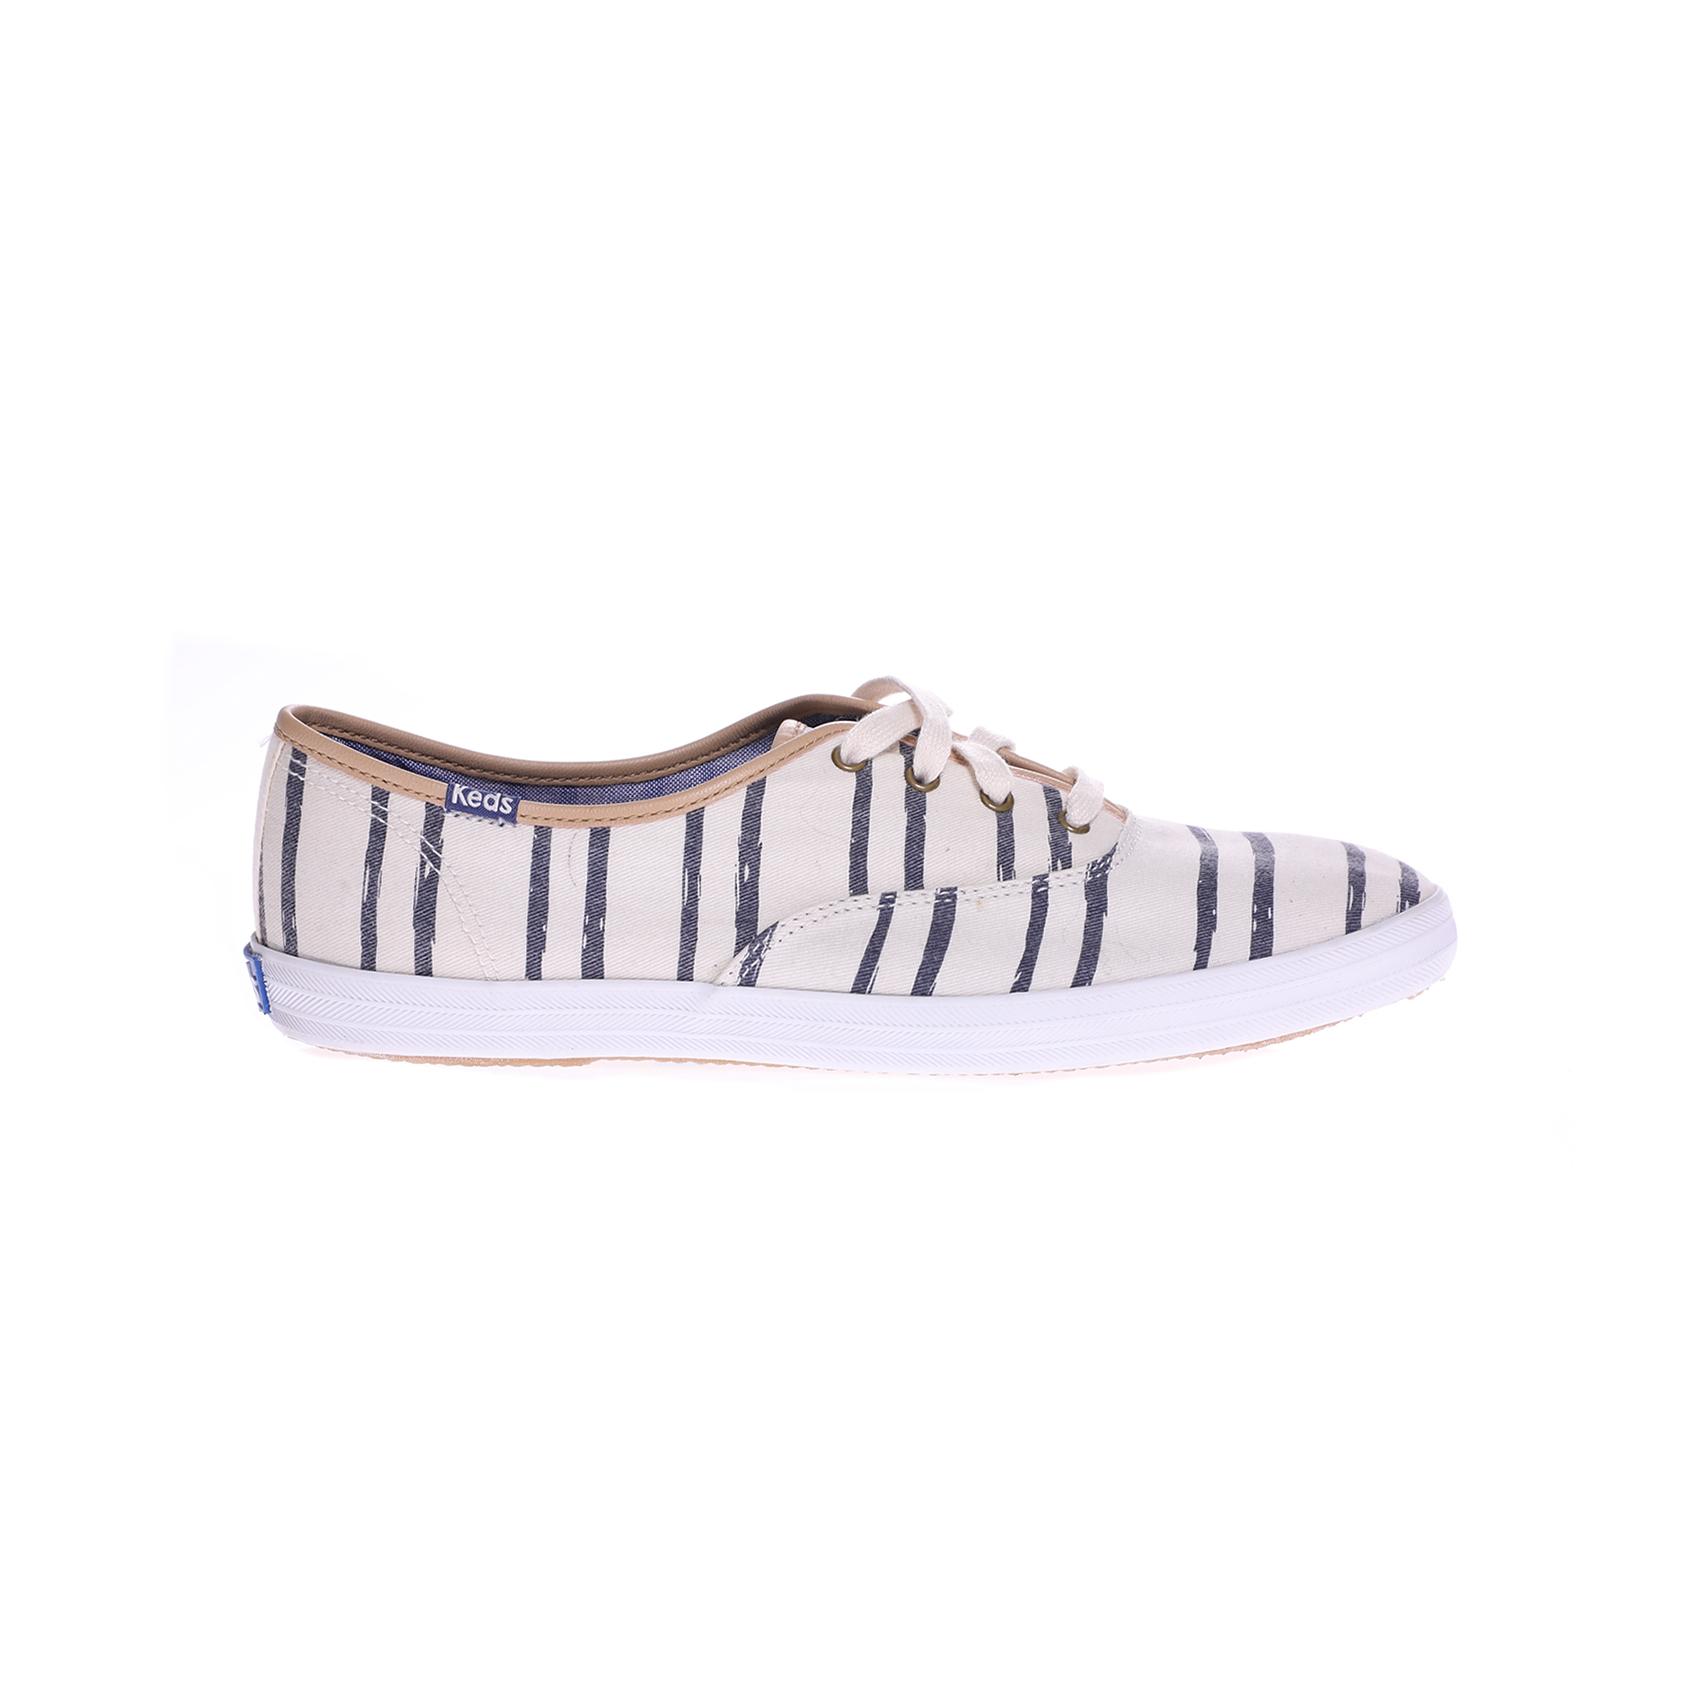 KEDS – Γυναικεία παπούτσια KEDS λευκά